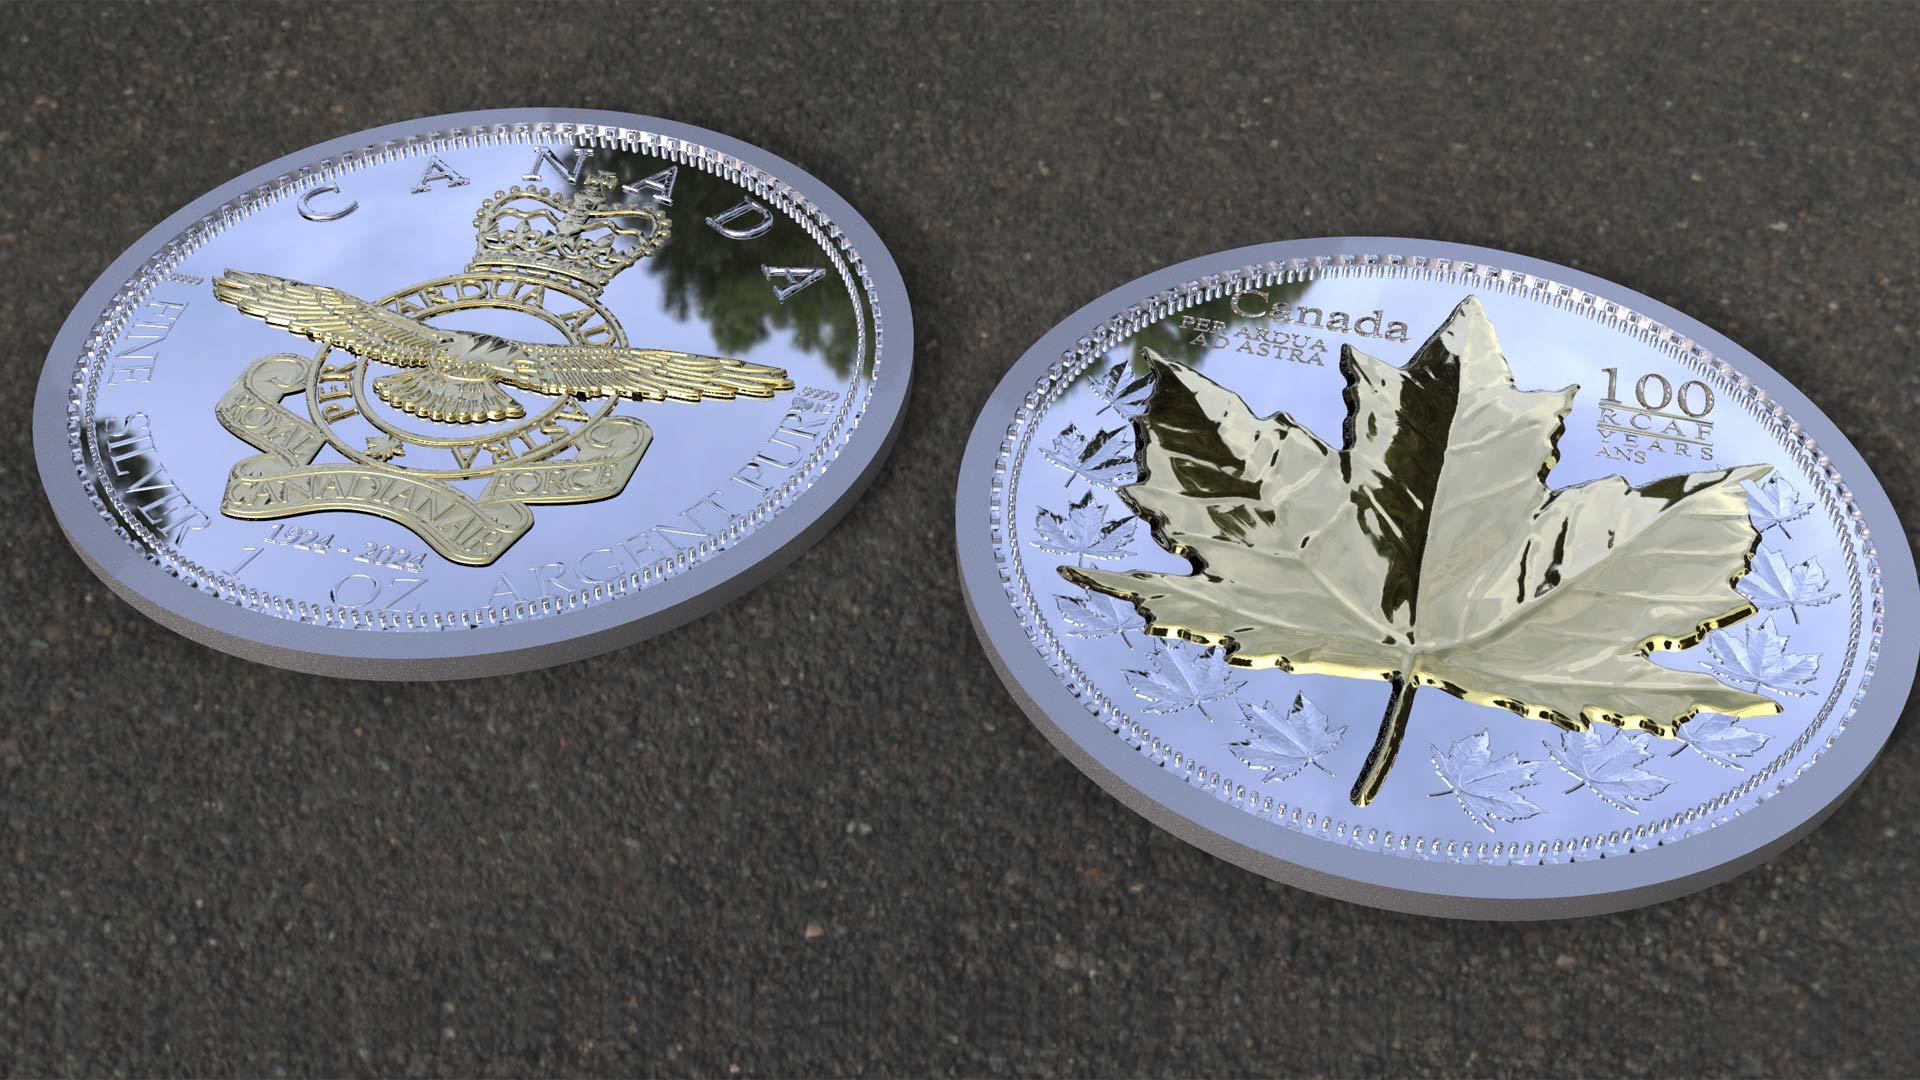 Century Coin